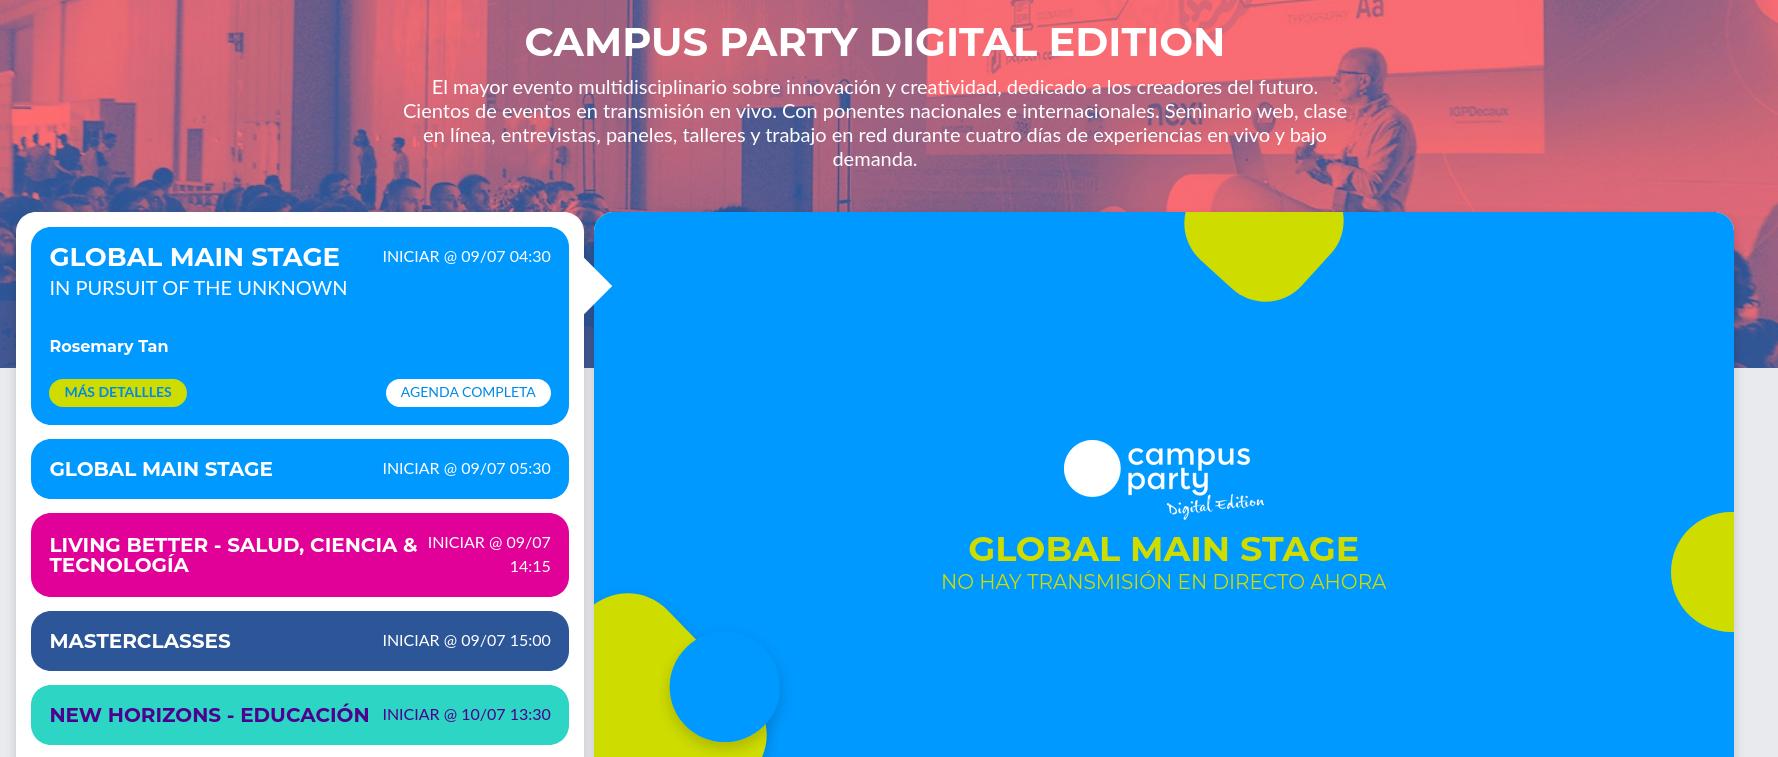 Campus Party Digital Edition 2020 Paraguay